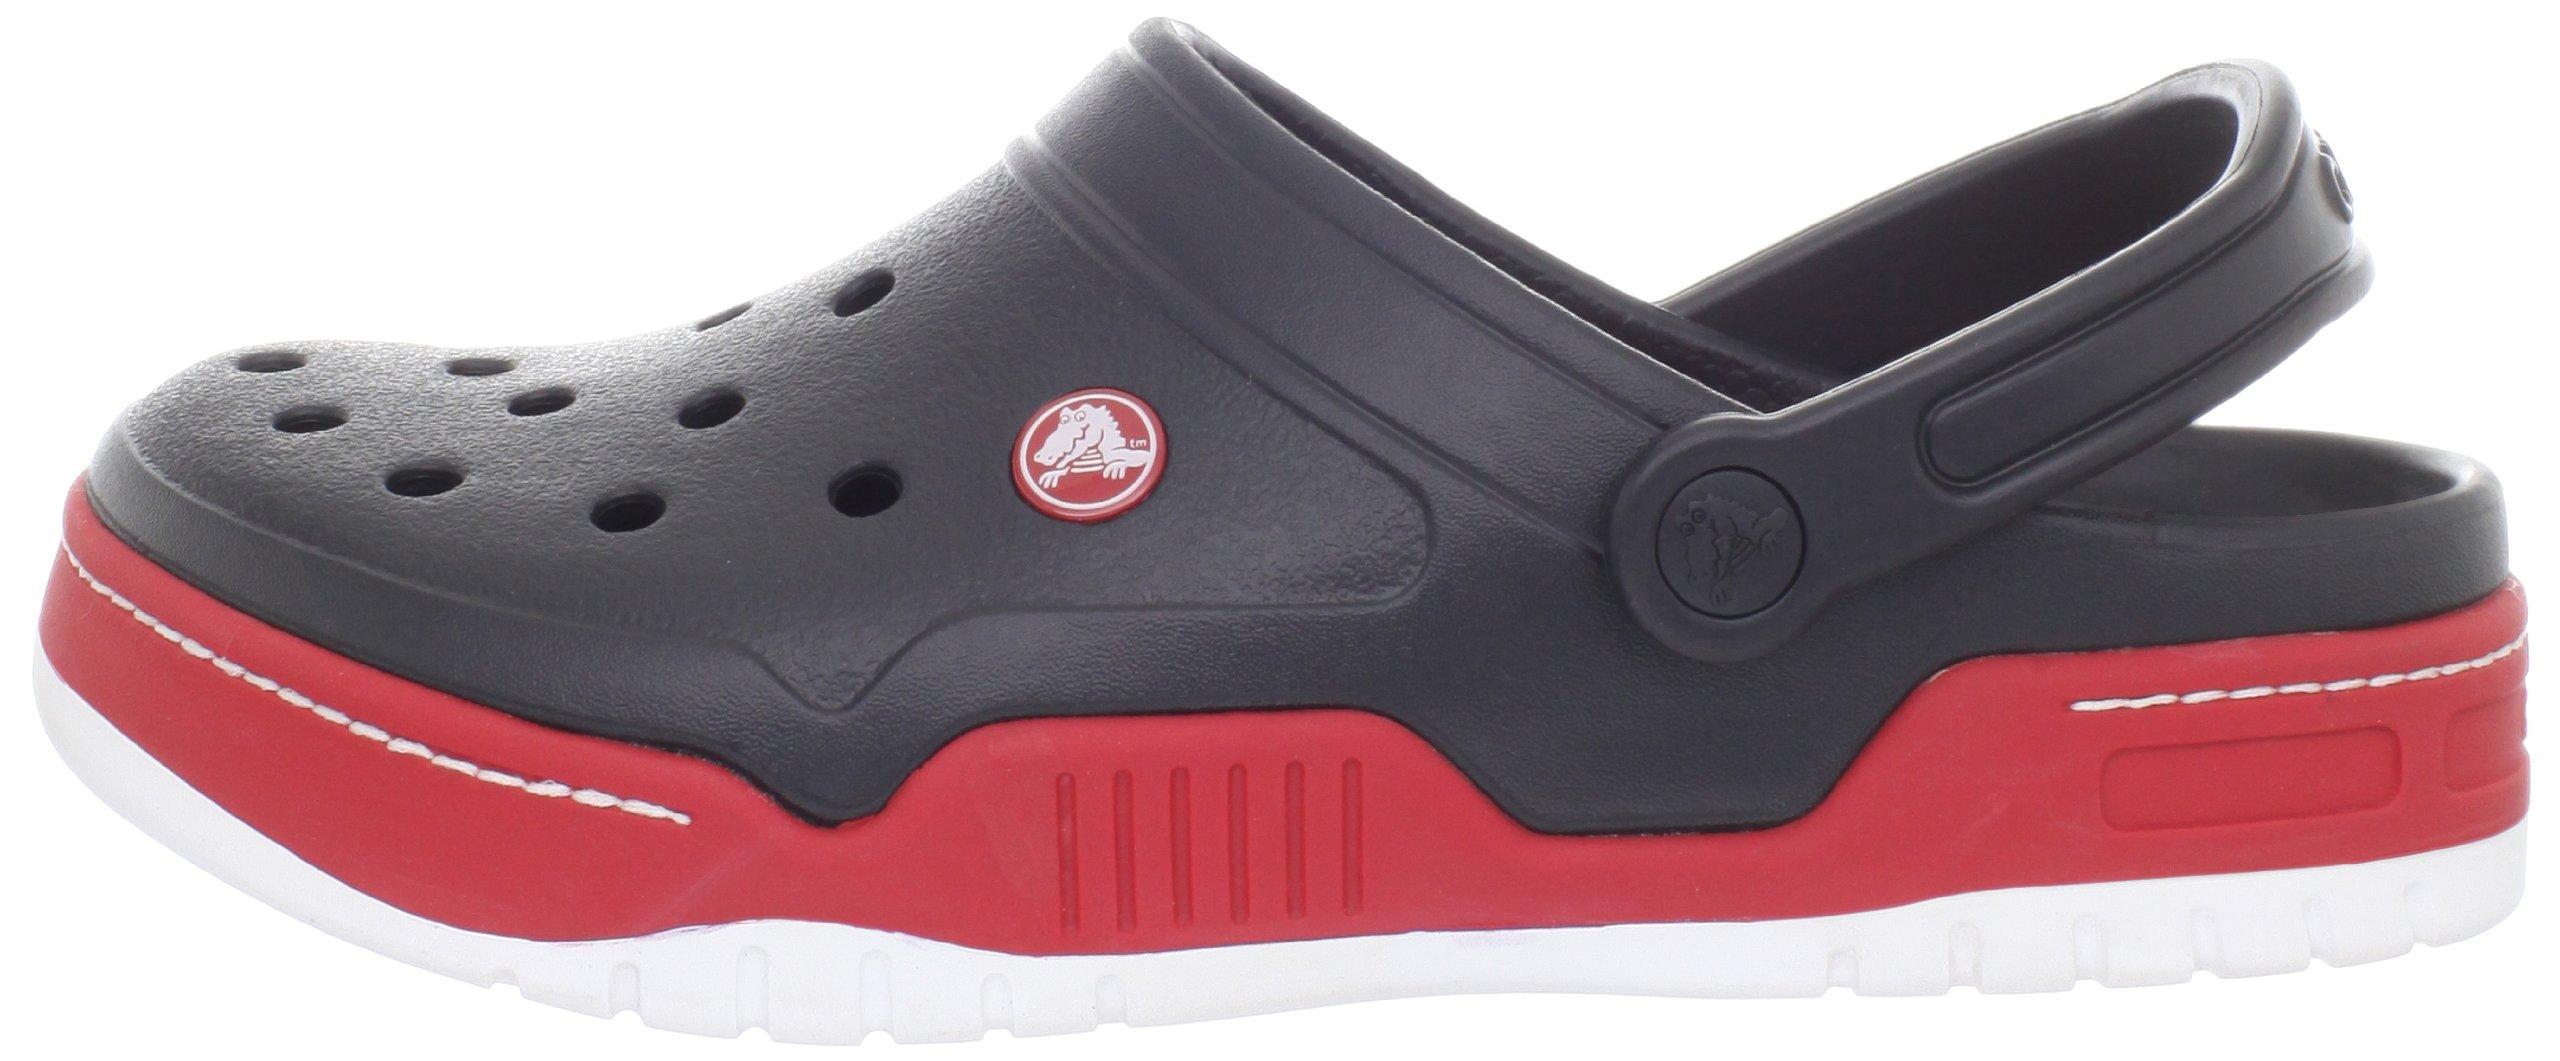 Crocs Men's 14300 Front Court Clog, Black/Red, 10 M US by Crocs (Image #5)